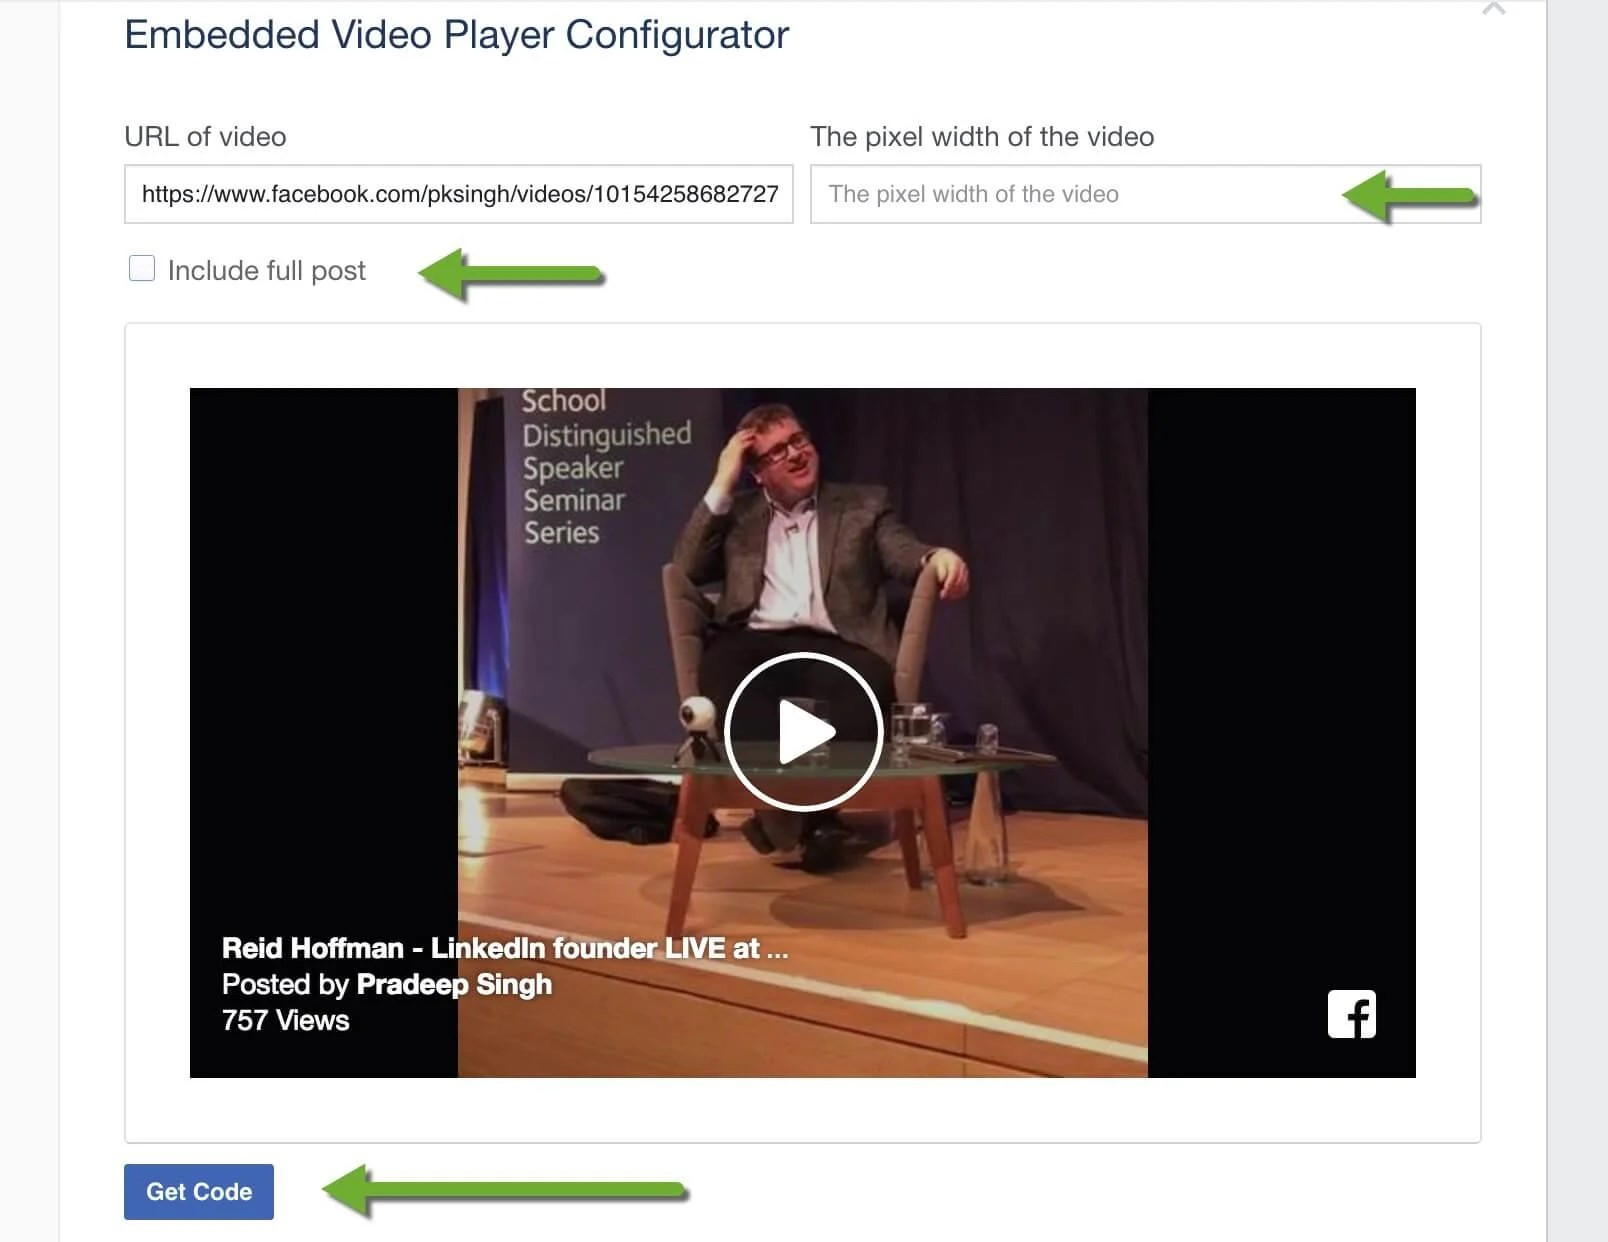 Configure Video Player of Facebook